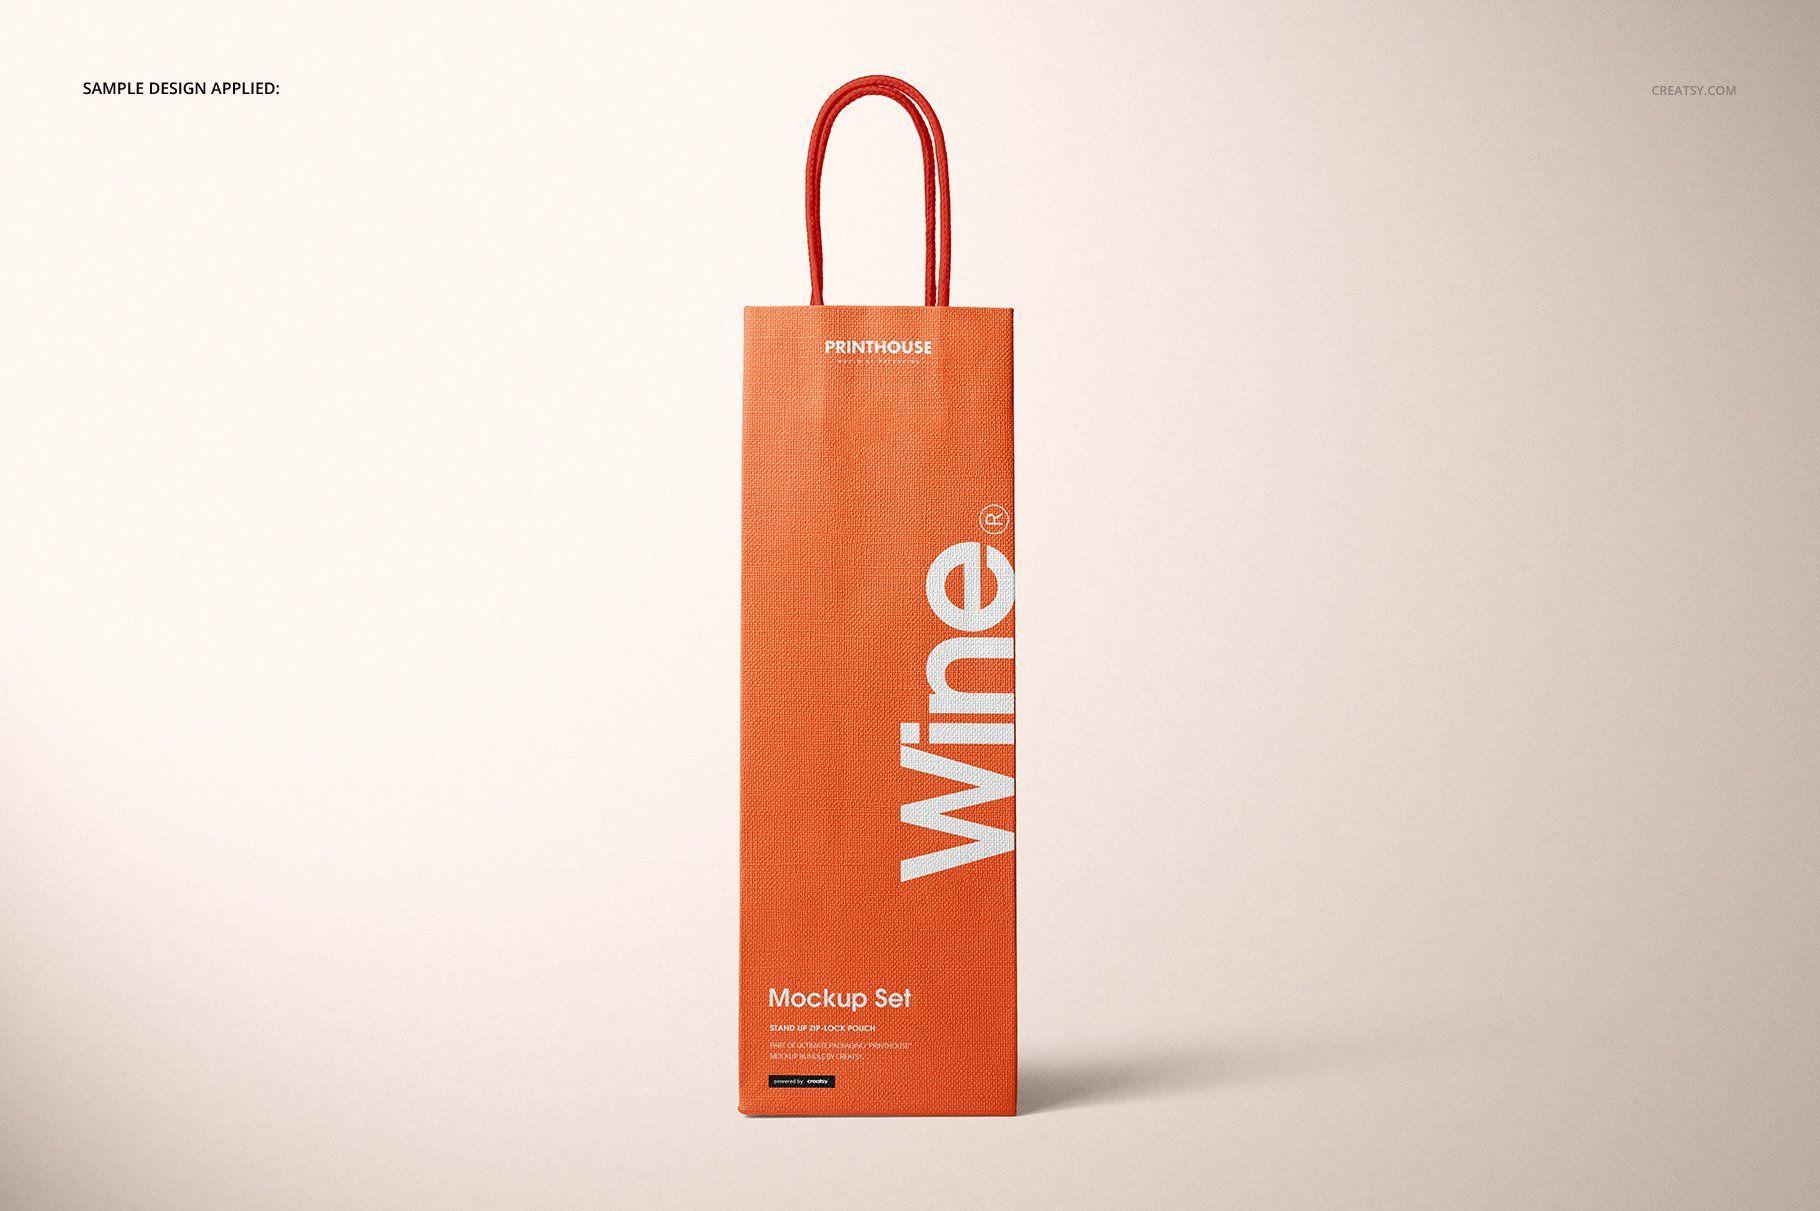 Download Eurotote Wine Tote Bag Mockup Set Wine Tote Bag Wine Tote Bag Mockup